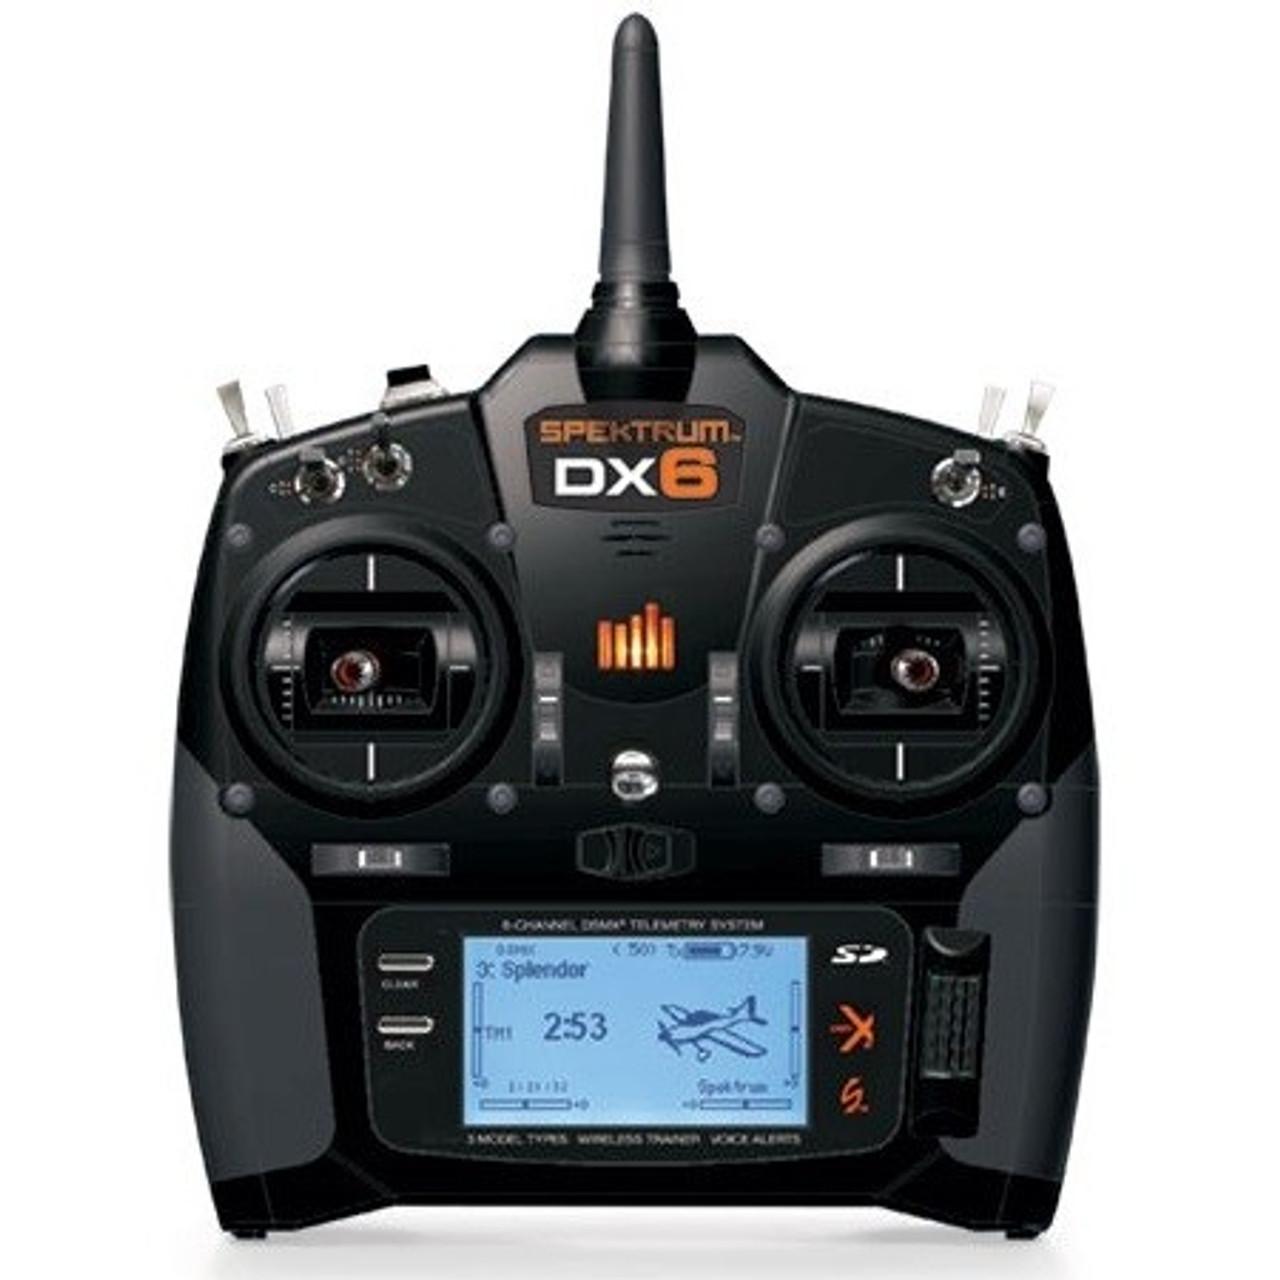 Spektrum DX6 6ch System w/ AR610 Receiver Mode 1